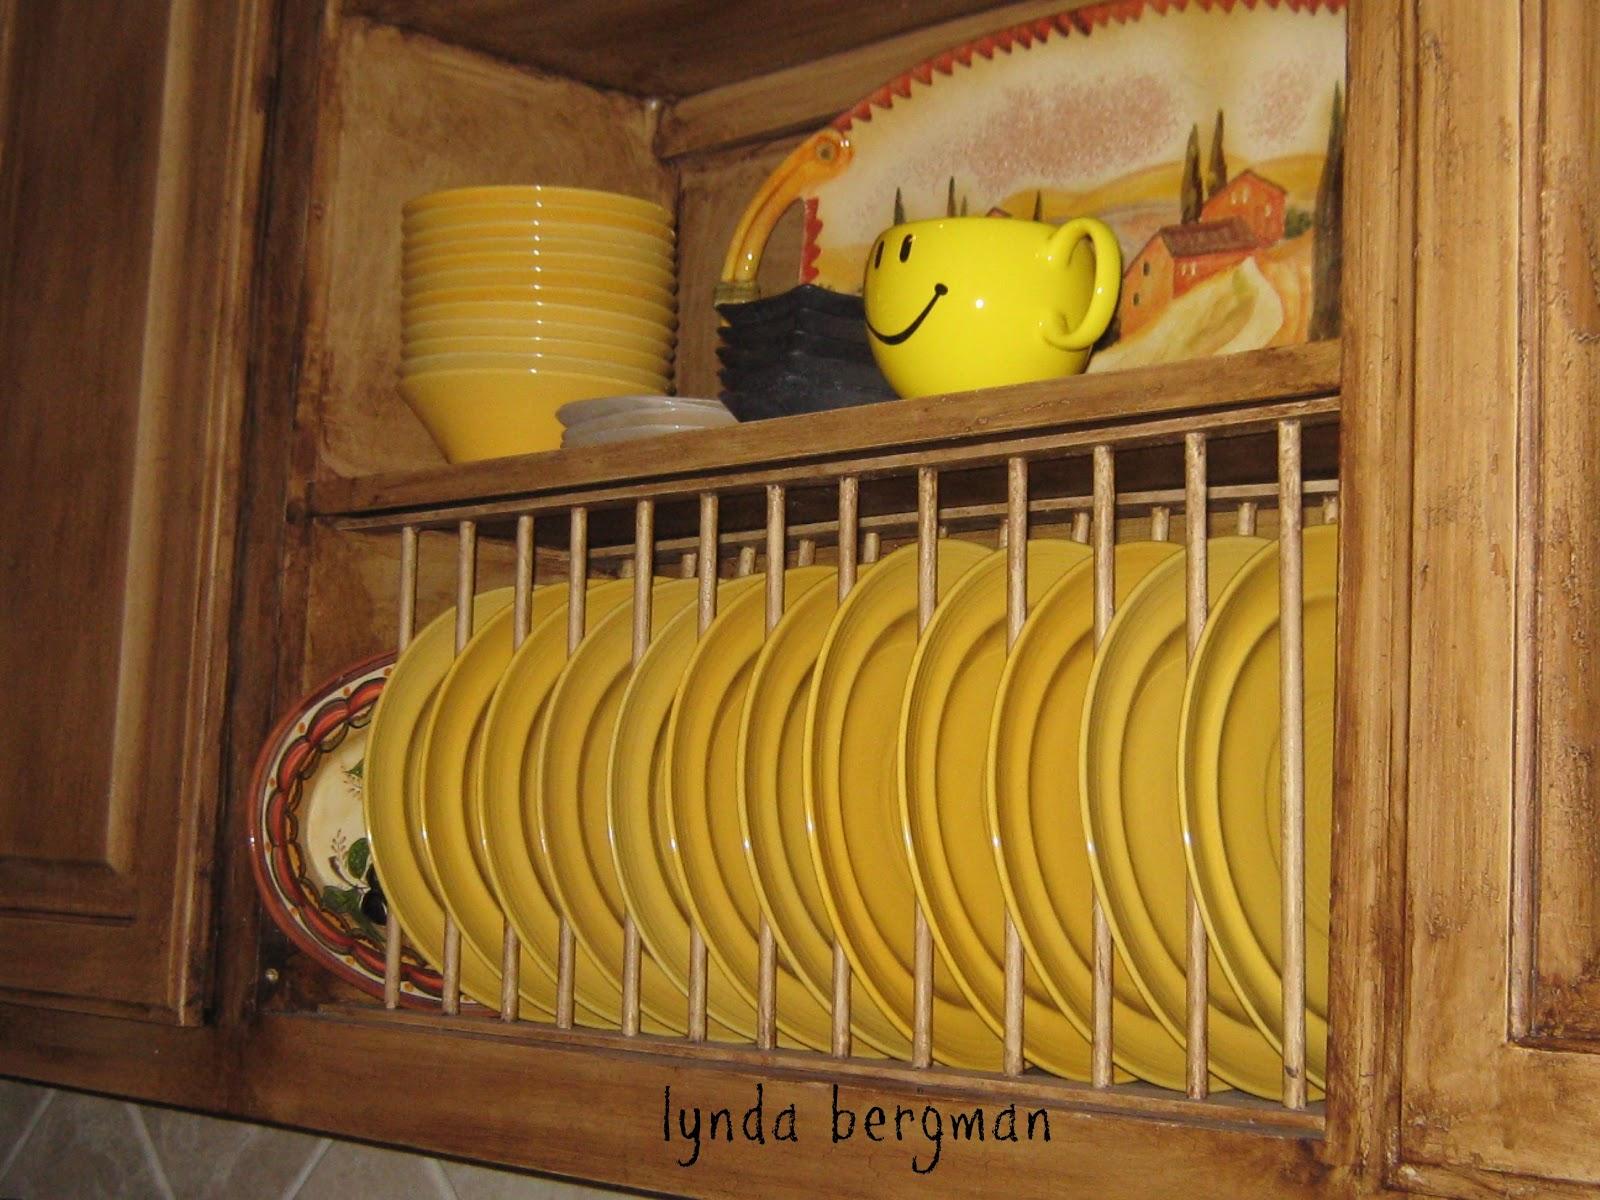 lynda bergman decorative artisan